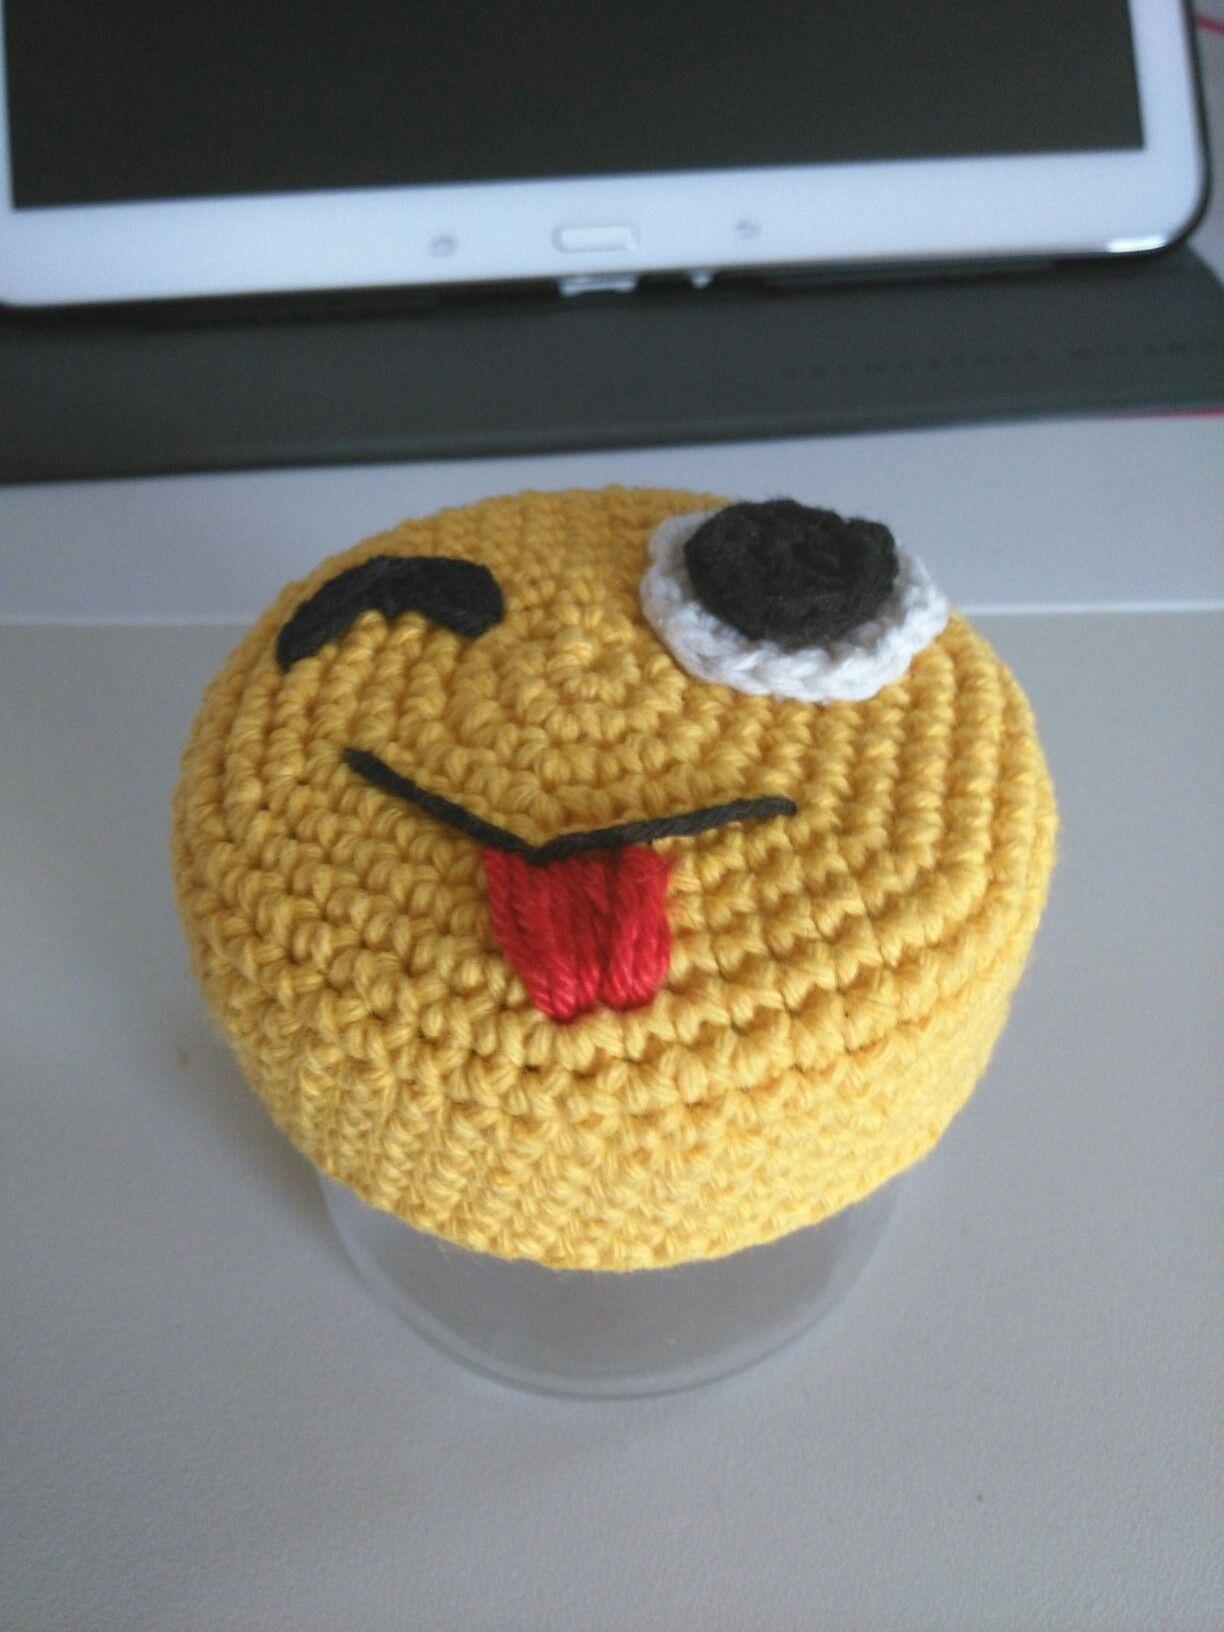 Emoji Potje Deksel Haken Pottenbewerken Pinterest Crochet